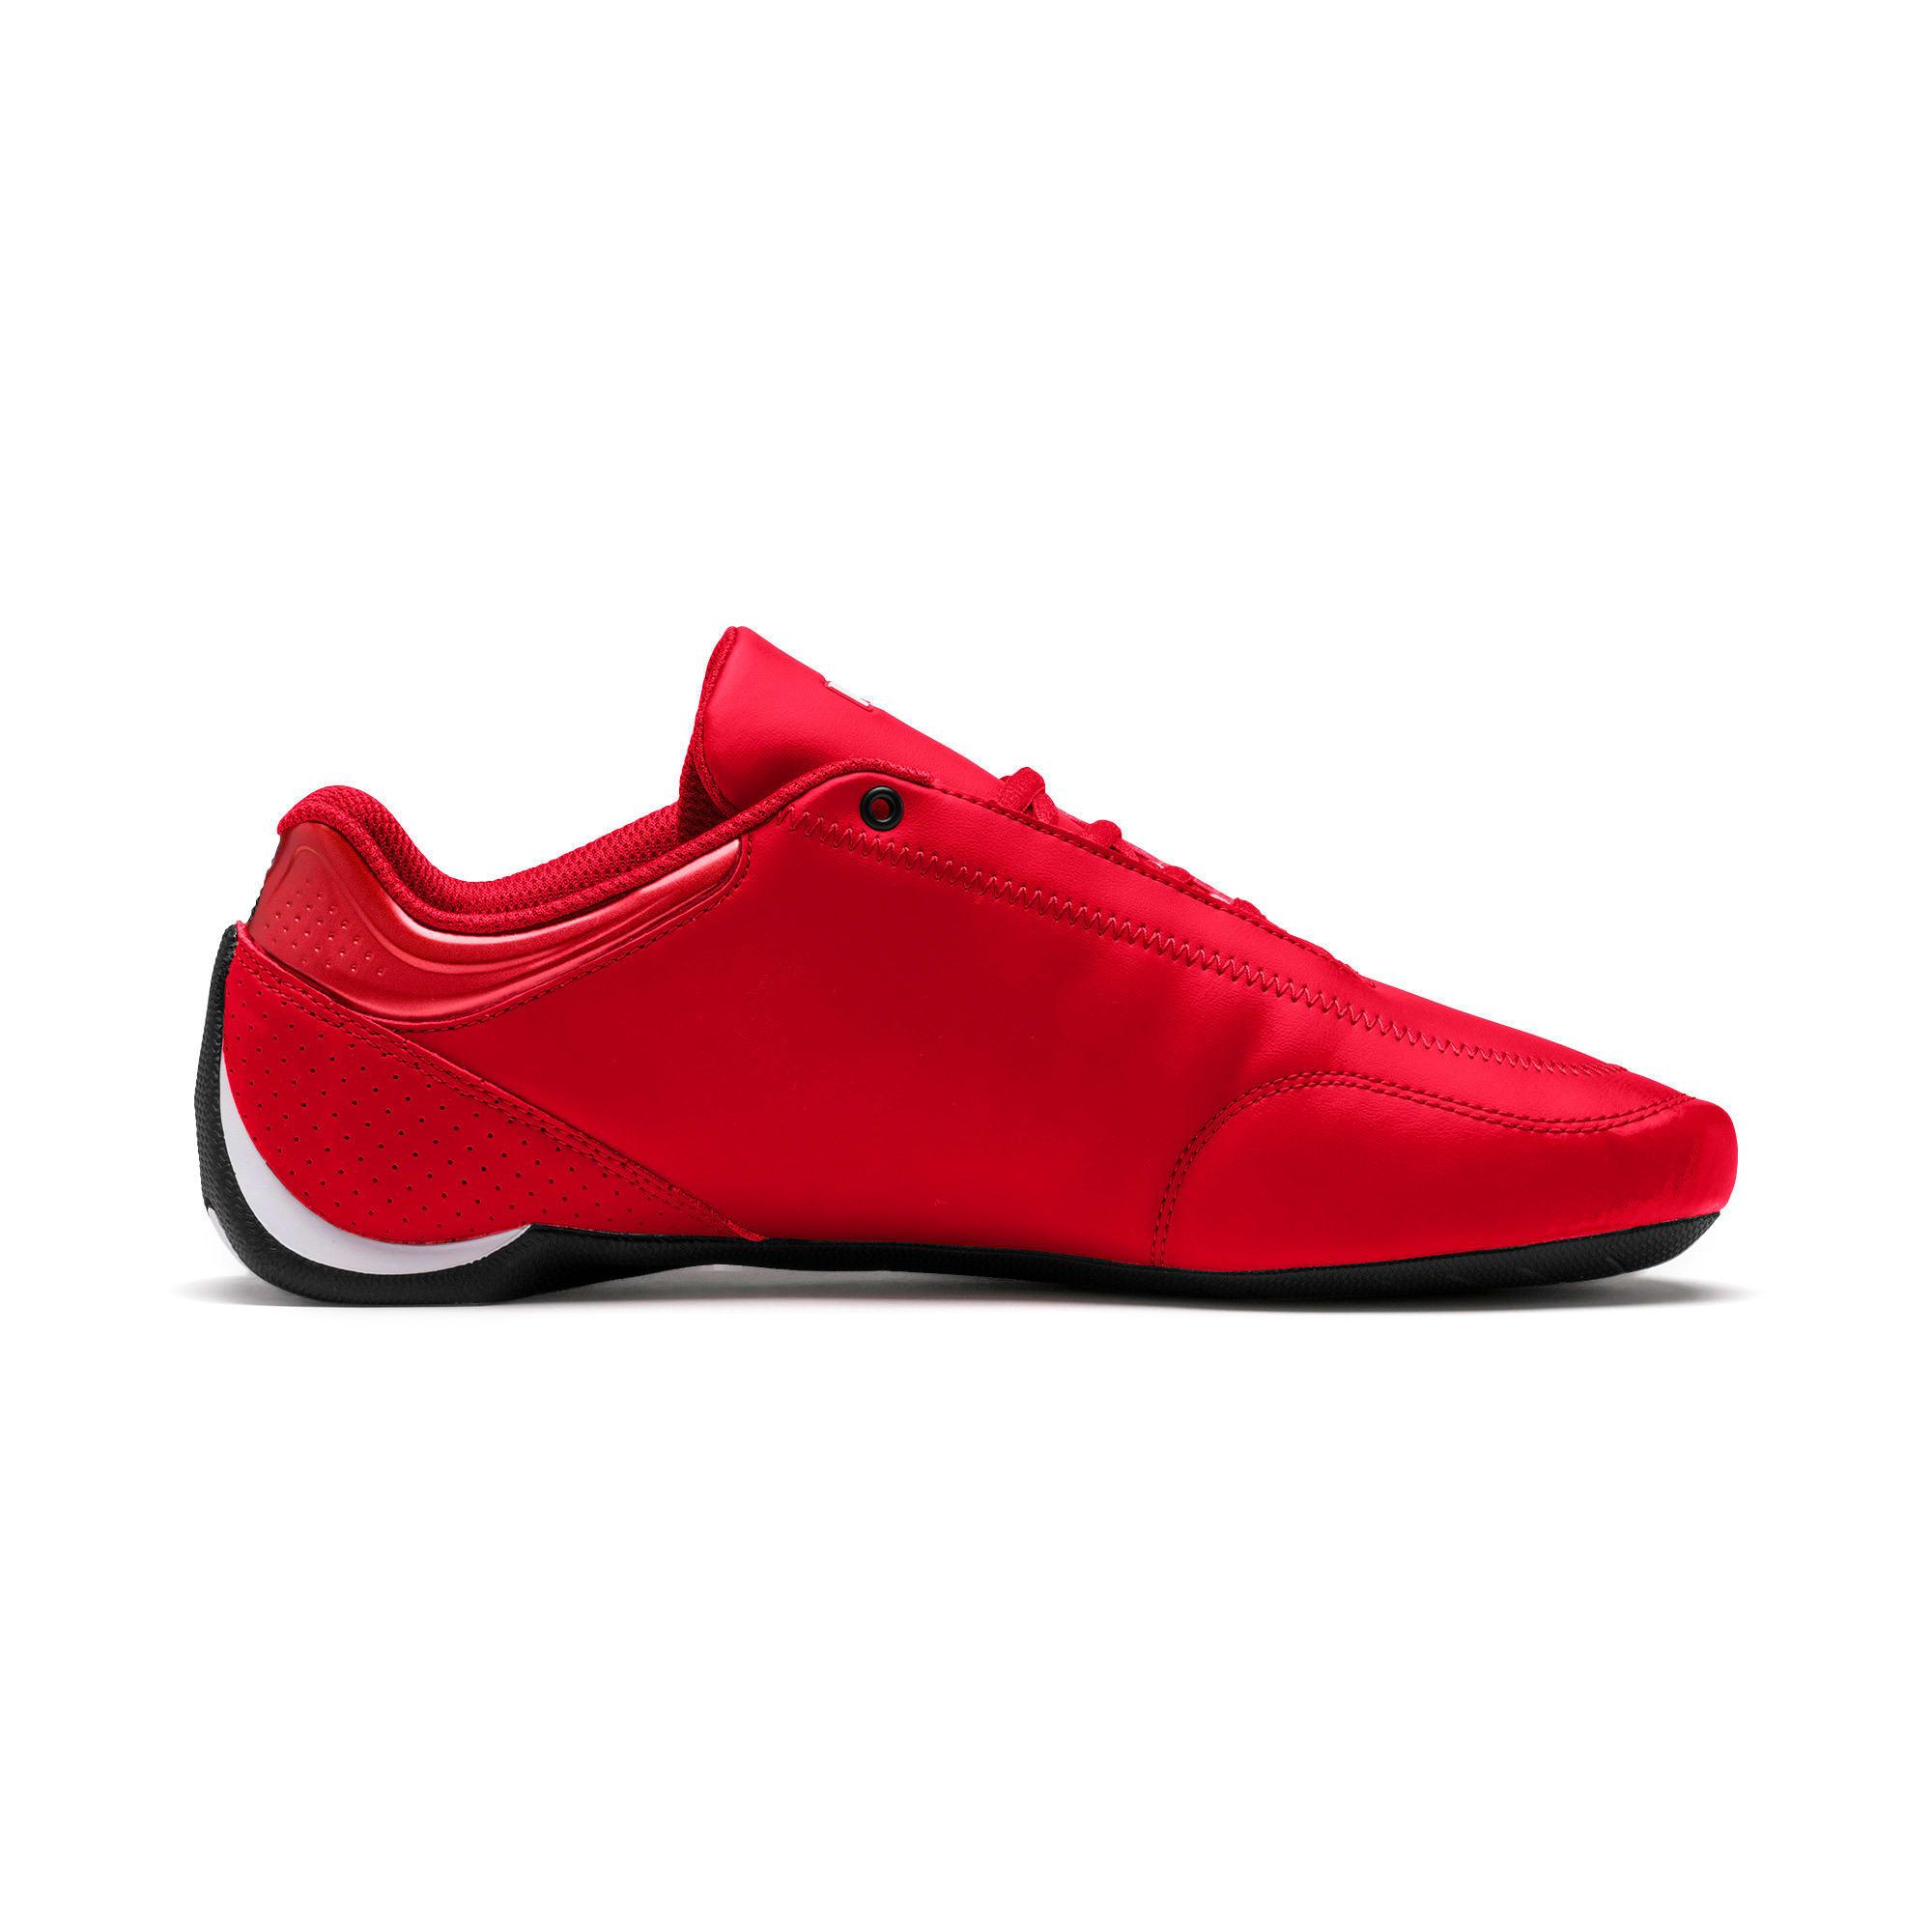 Miniatura 6 de ZapatosScuderiaFerrariFuture Kart Cat, Rosso Corsa-Puma Black, mediano